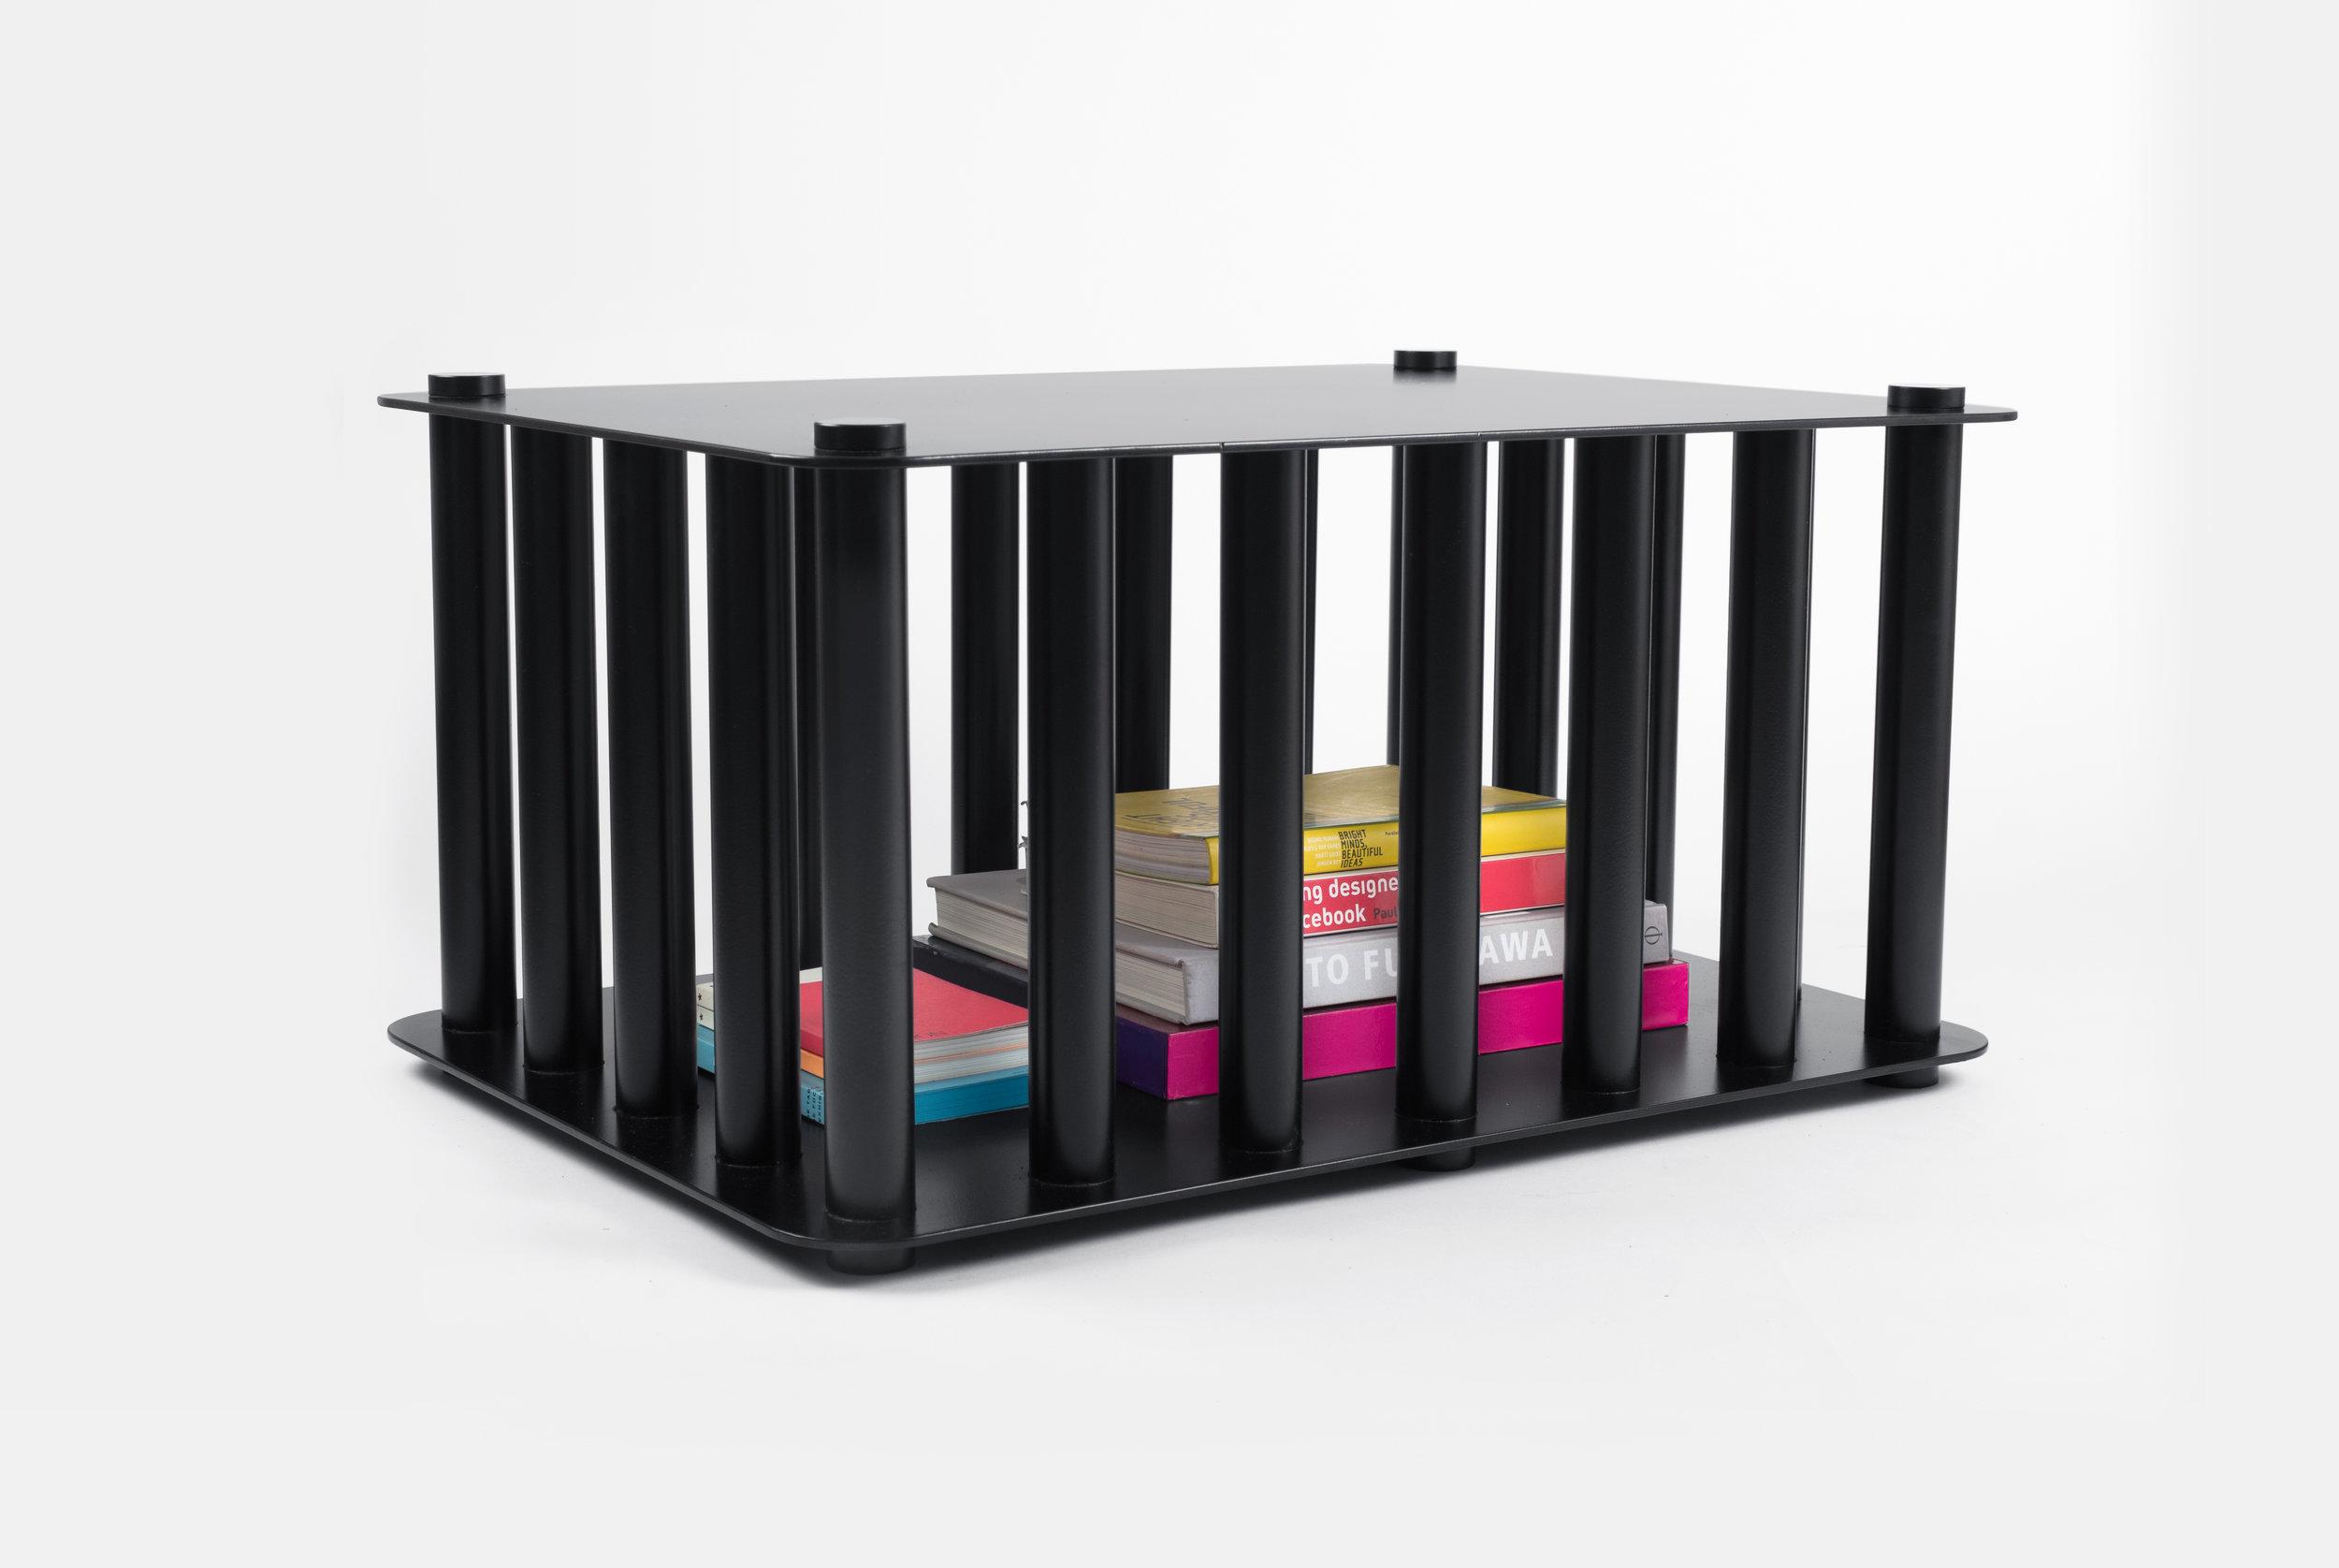 jorge-diego-etienne-cages-16